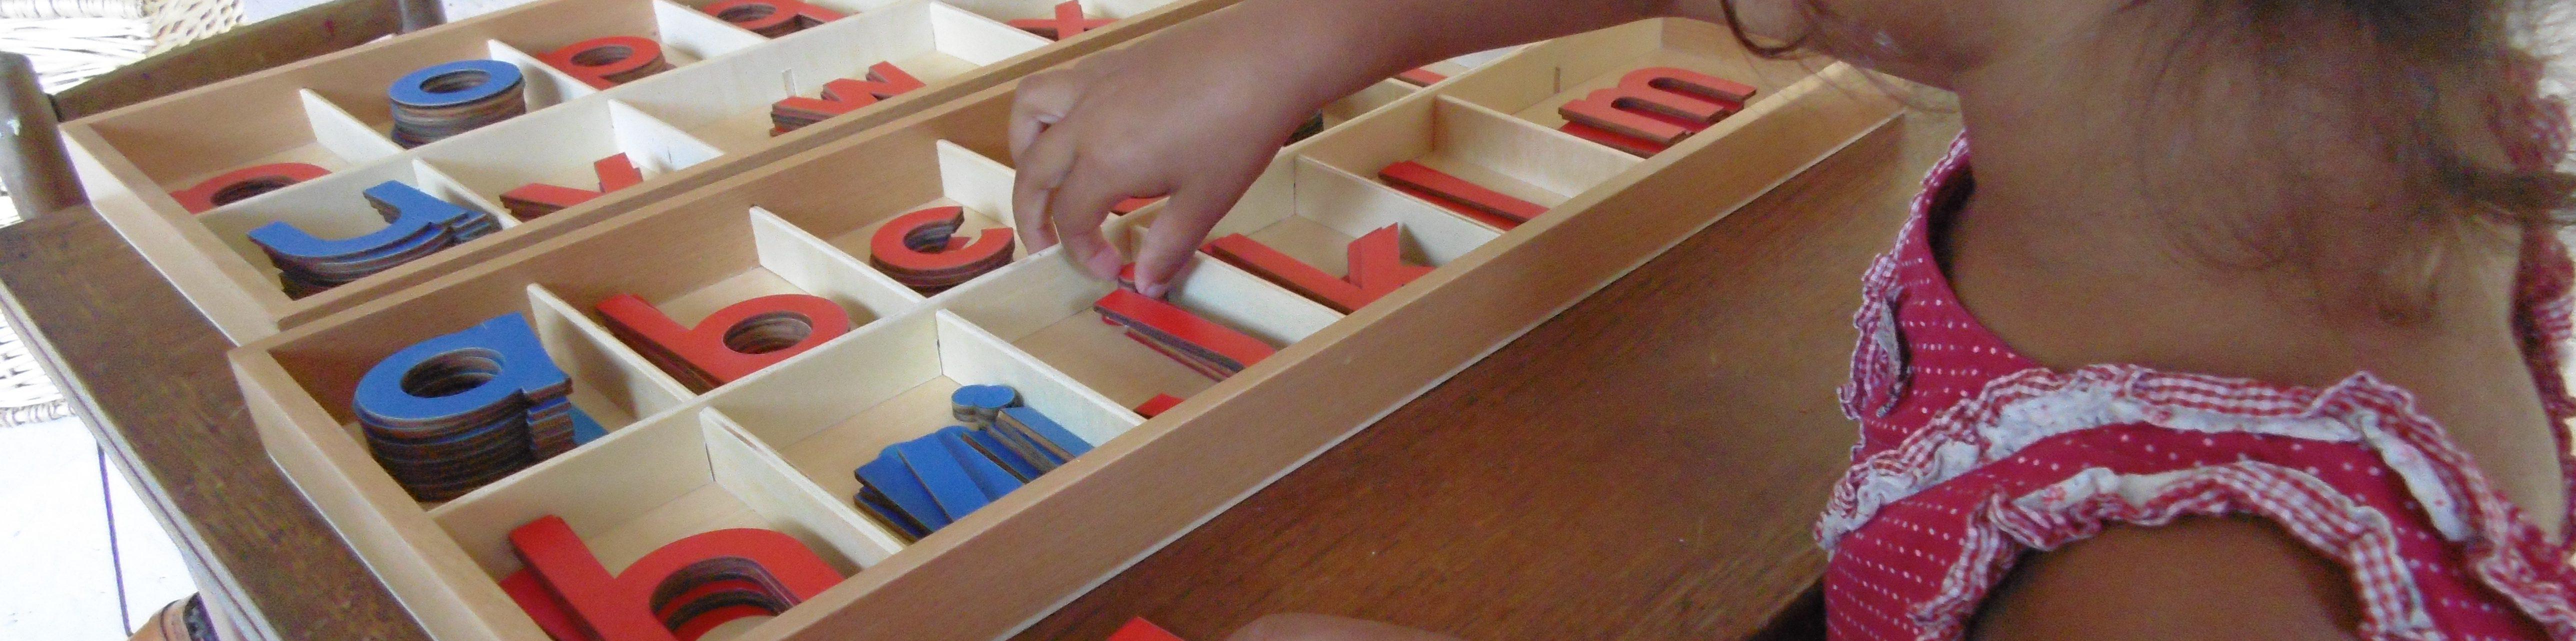 Ateliers d'inspiration Montessori en Goëlo